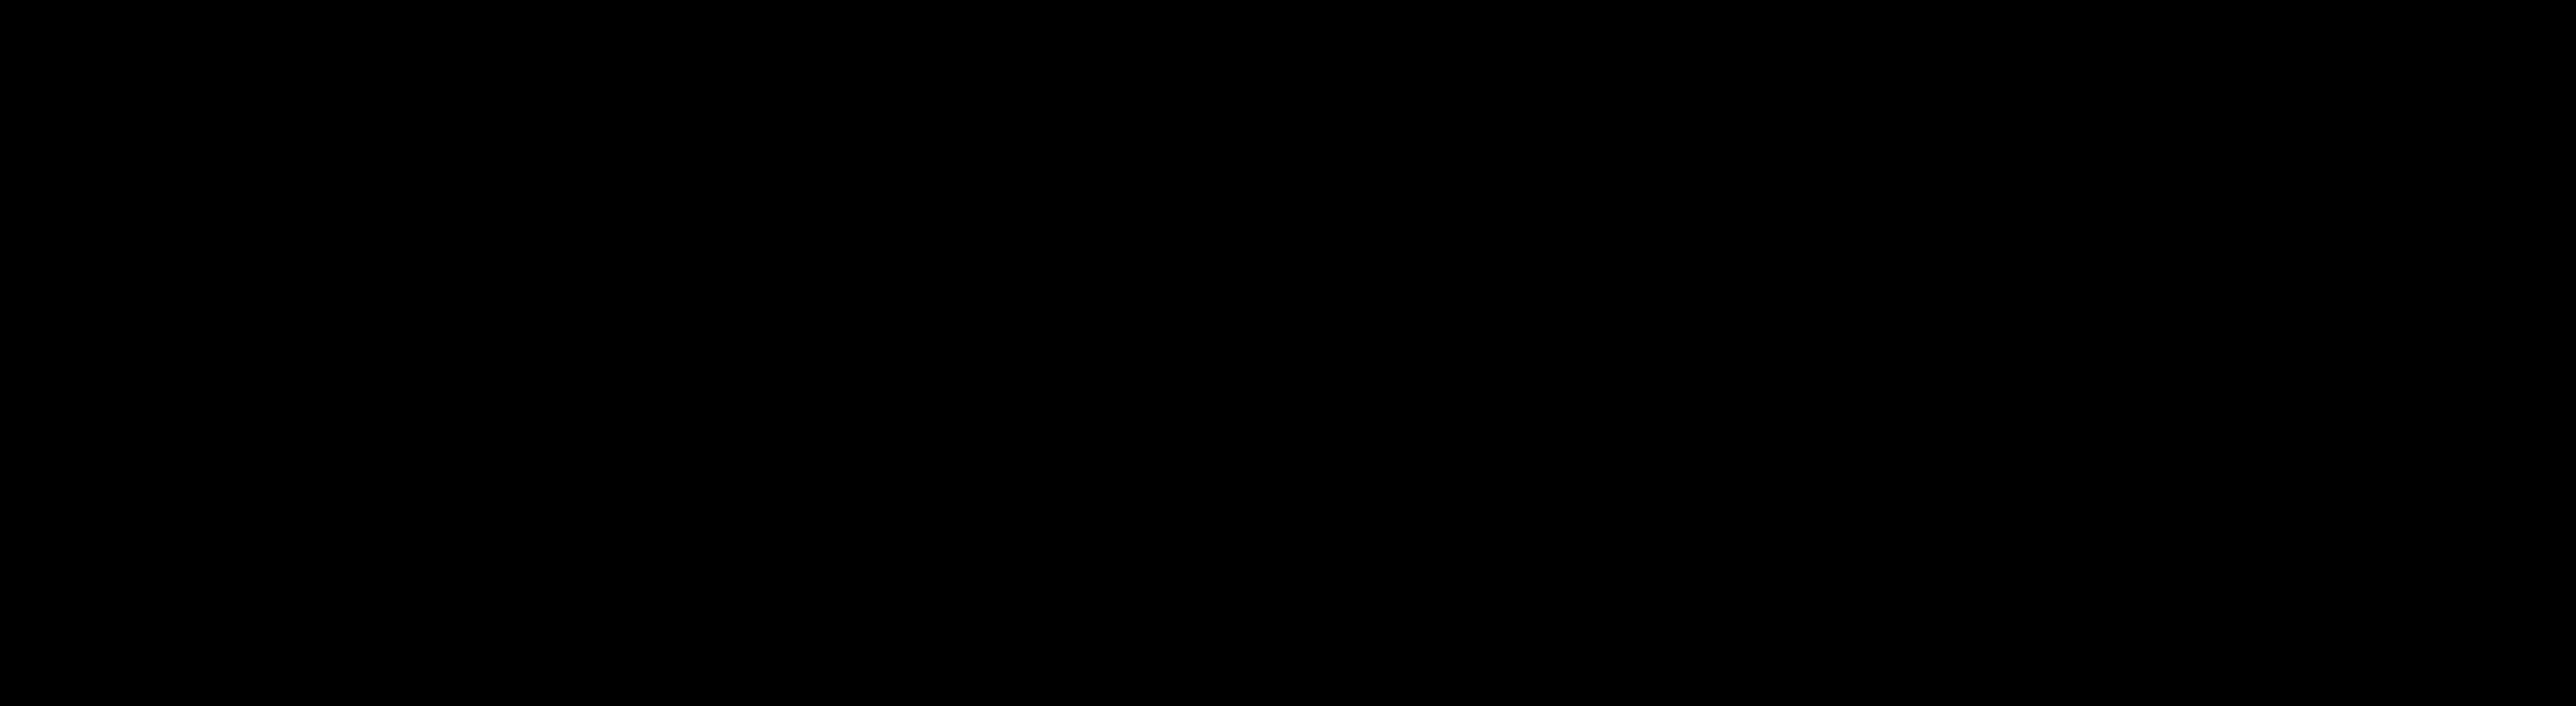 napster logo - Napster Logo